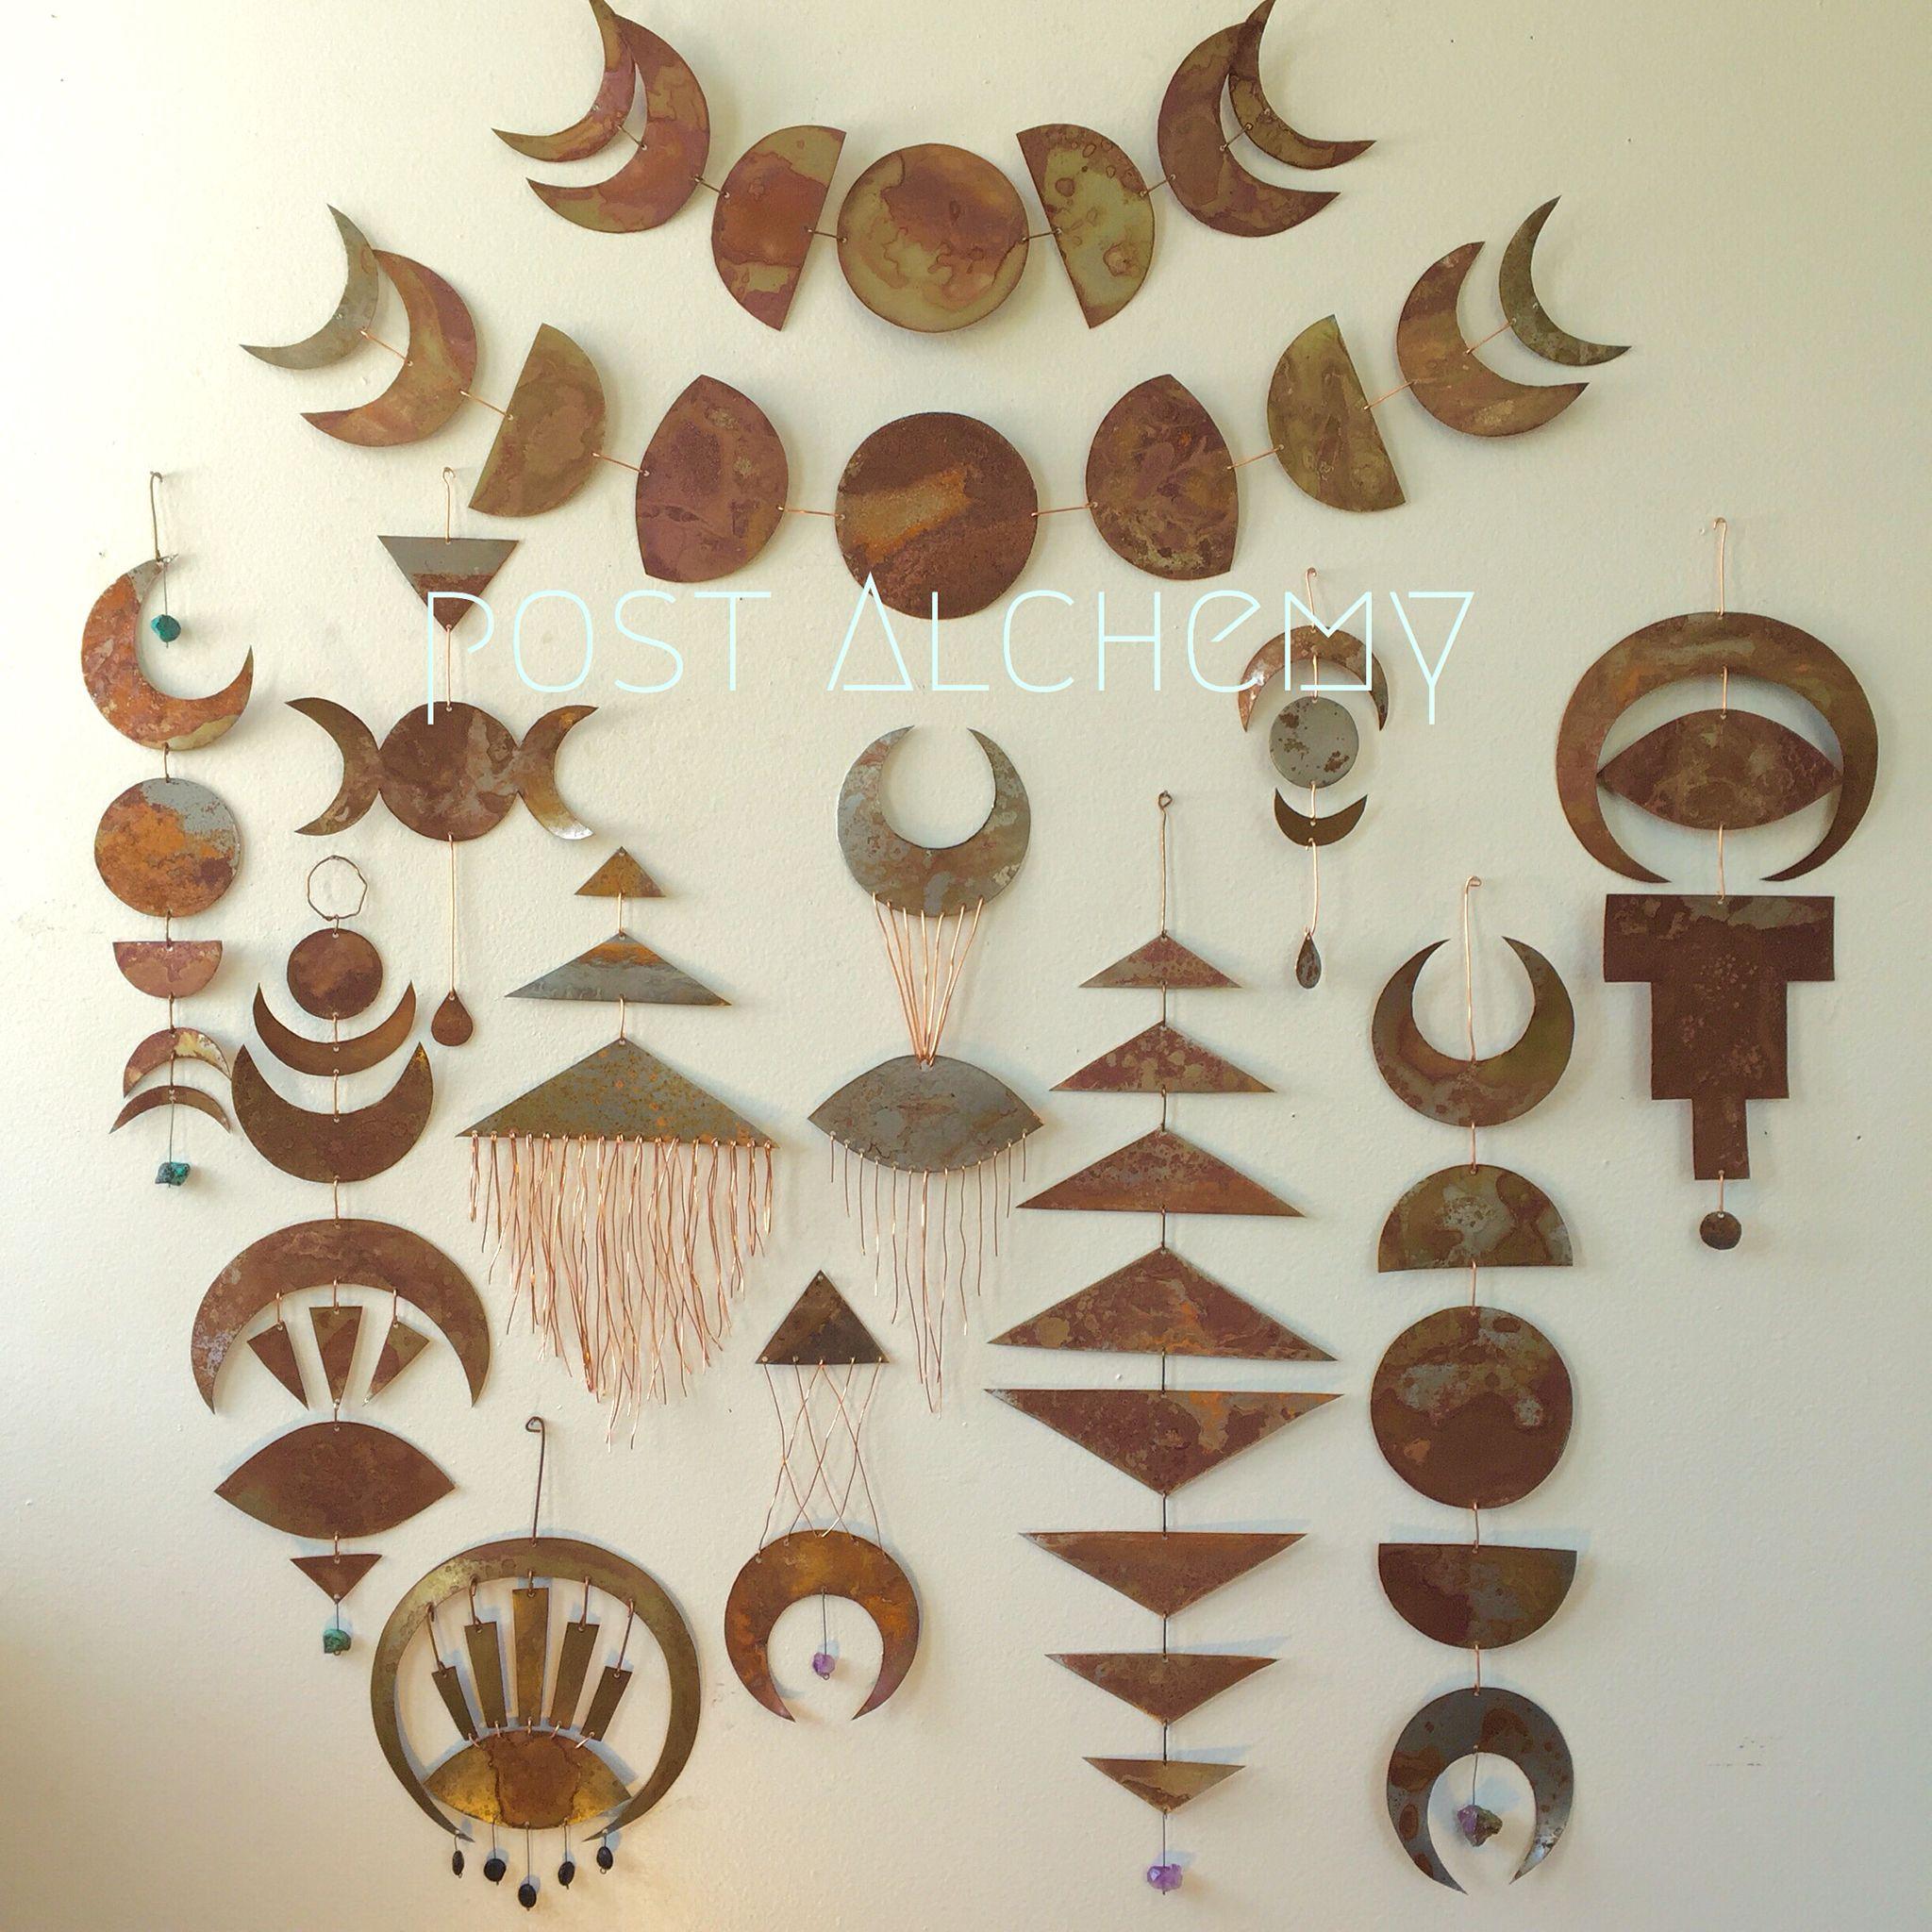 Symbolic Metal Wall Hangings Made By Melanie Mccallum Of Postalchemy Etsy Shop Clay Wall Hanging Diy Wall Art Hanging Wall Decor